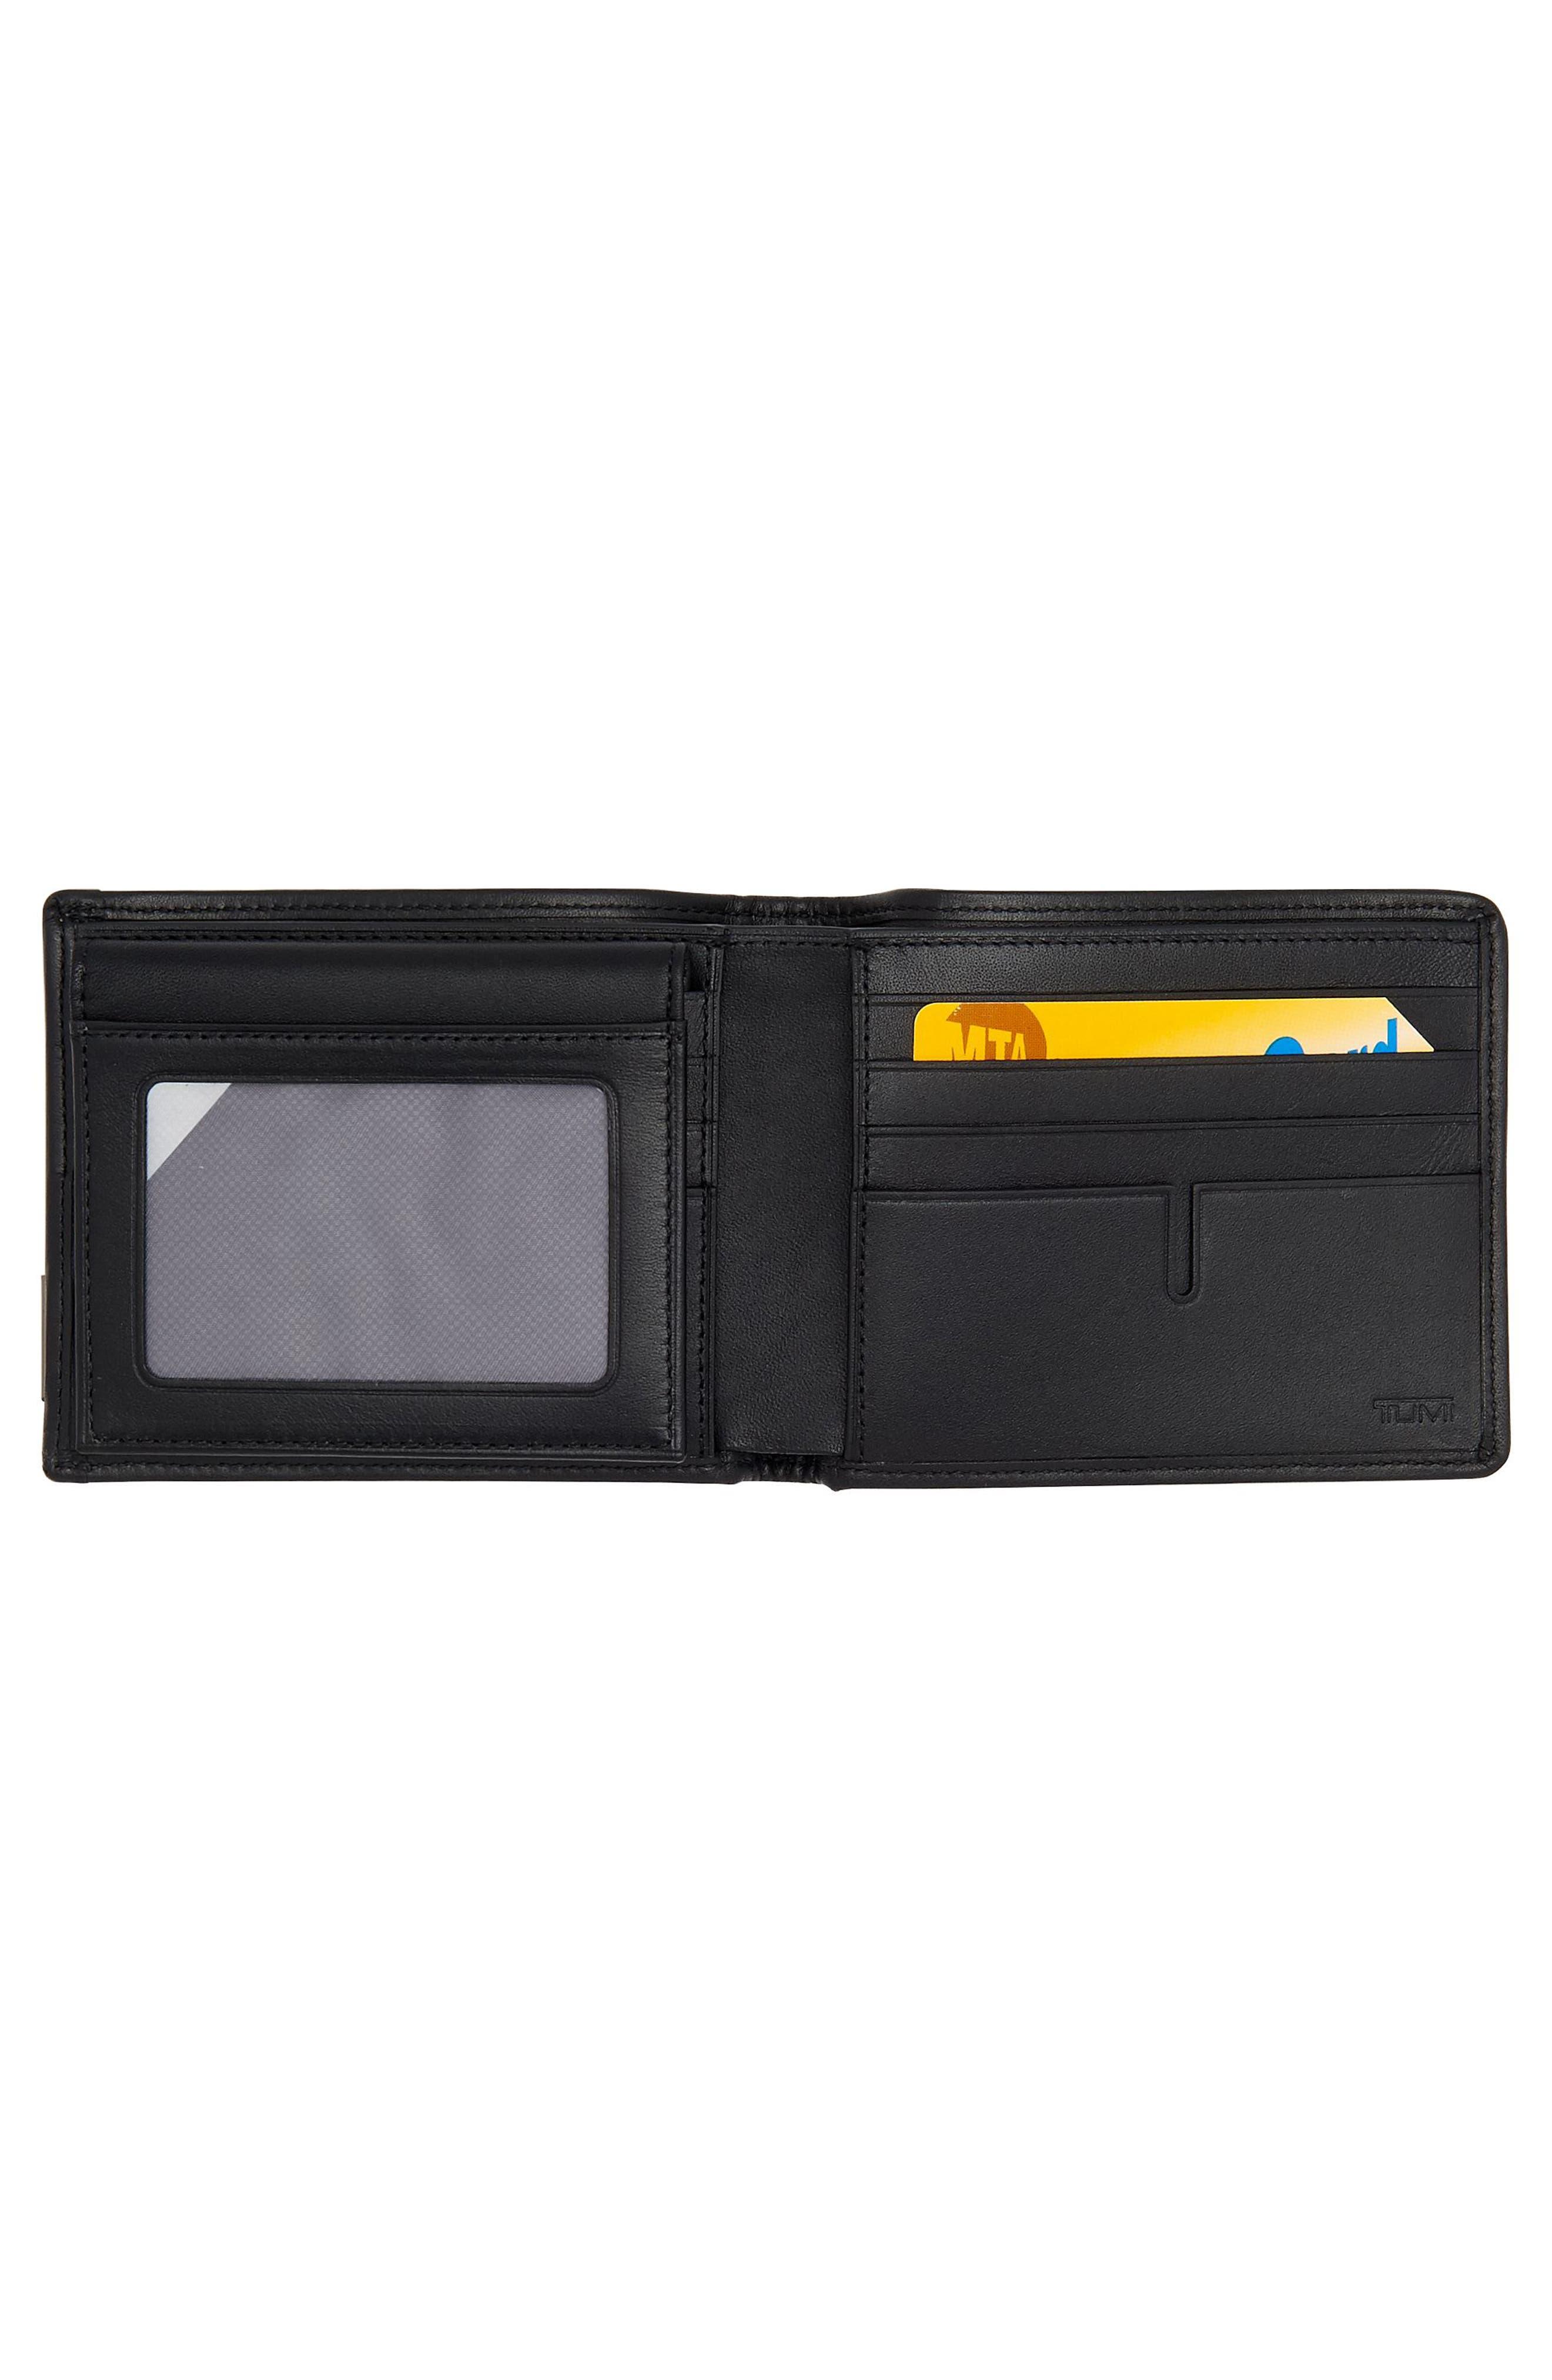 Alpha Global Pass Case Wallet,                             Alternate thumbnail 2, color,                             Anthracite/ Black